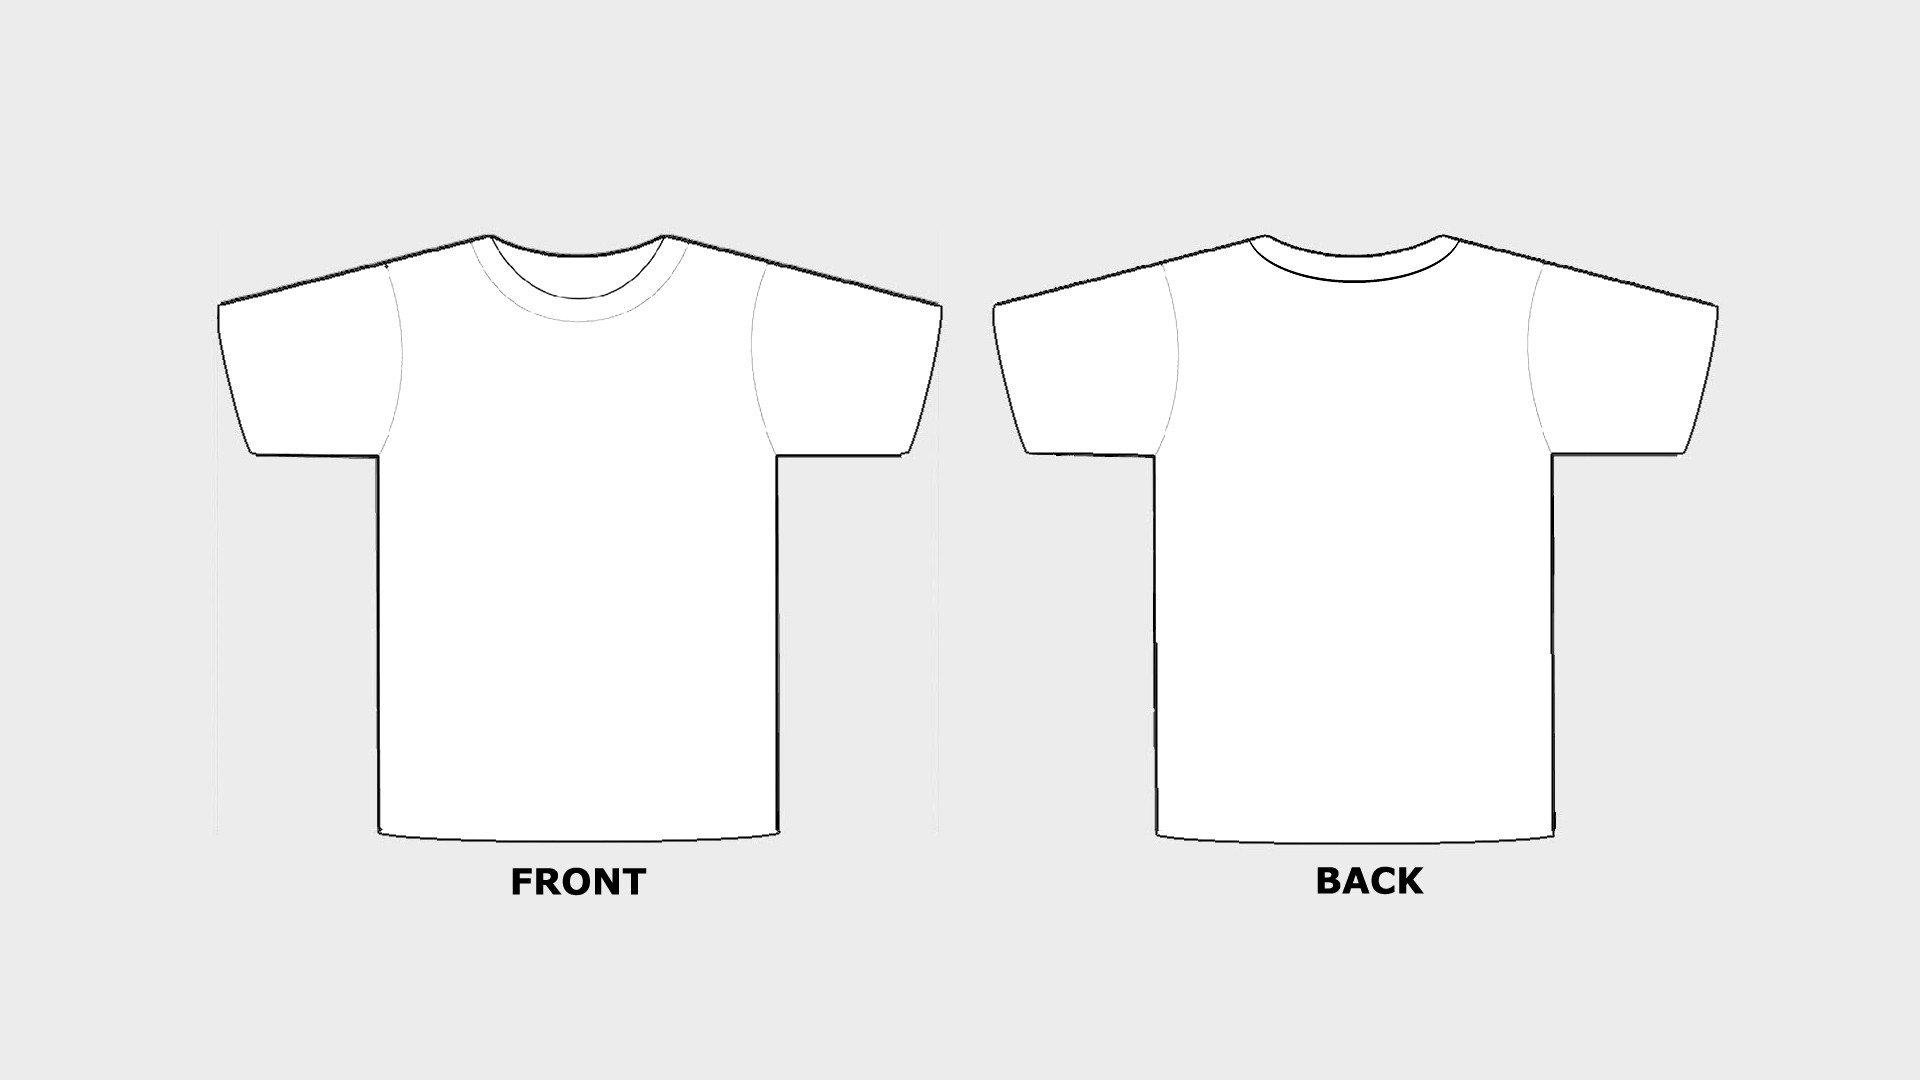 Printable T Shirt Templates Blank Tshirt Template Printable In Hd Hd Wallpapers